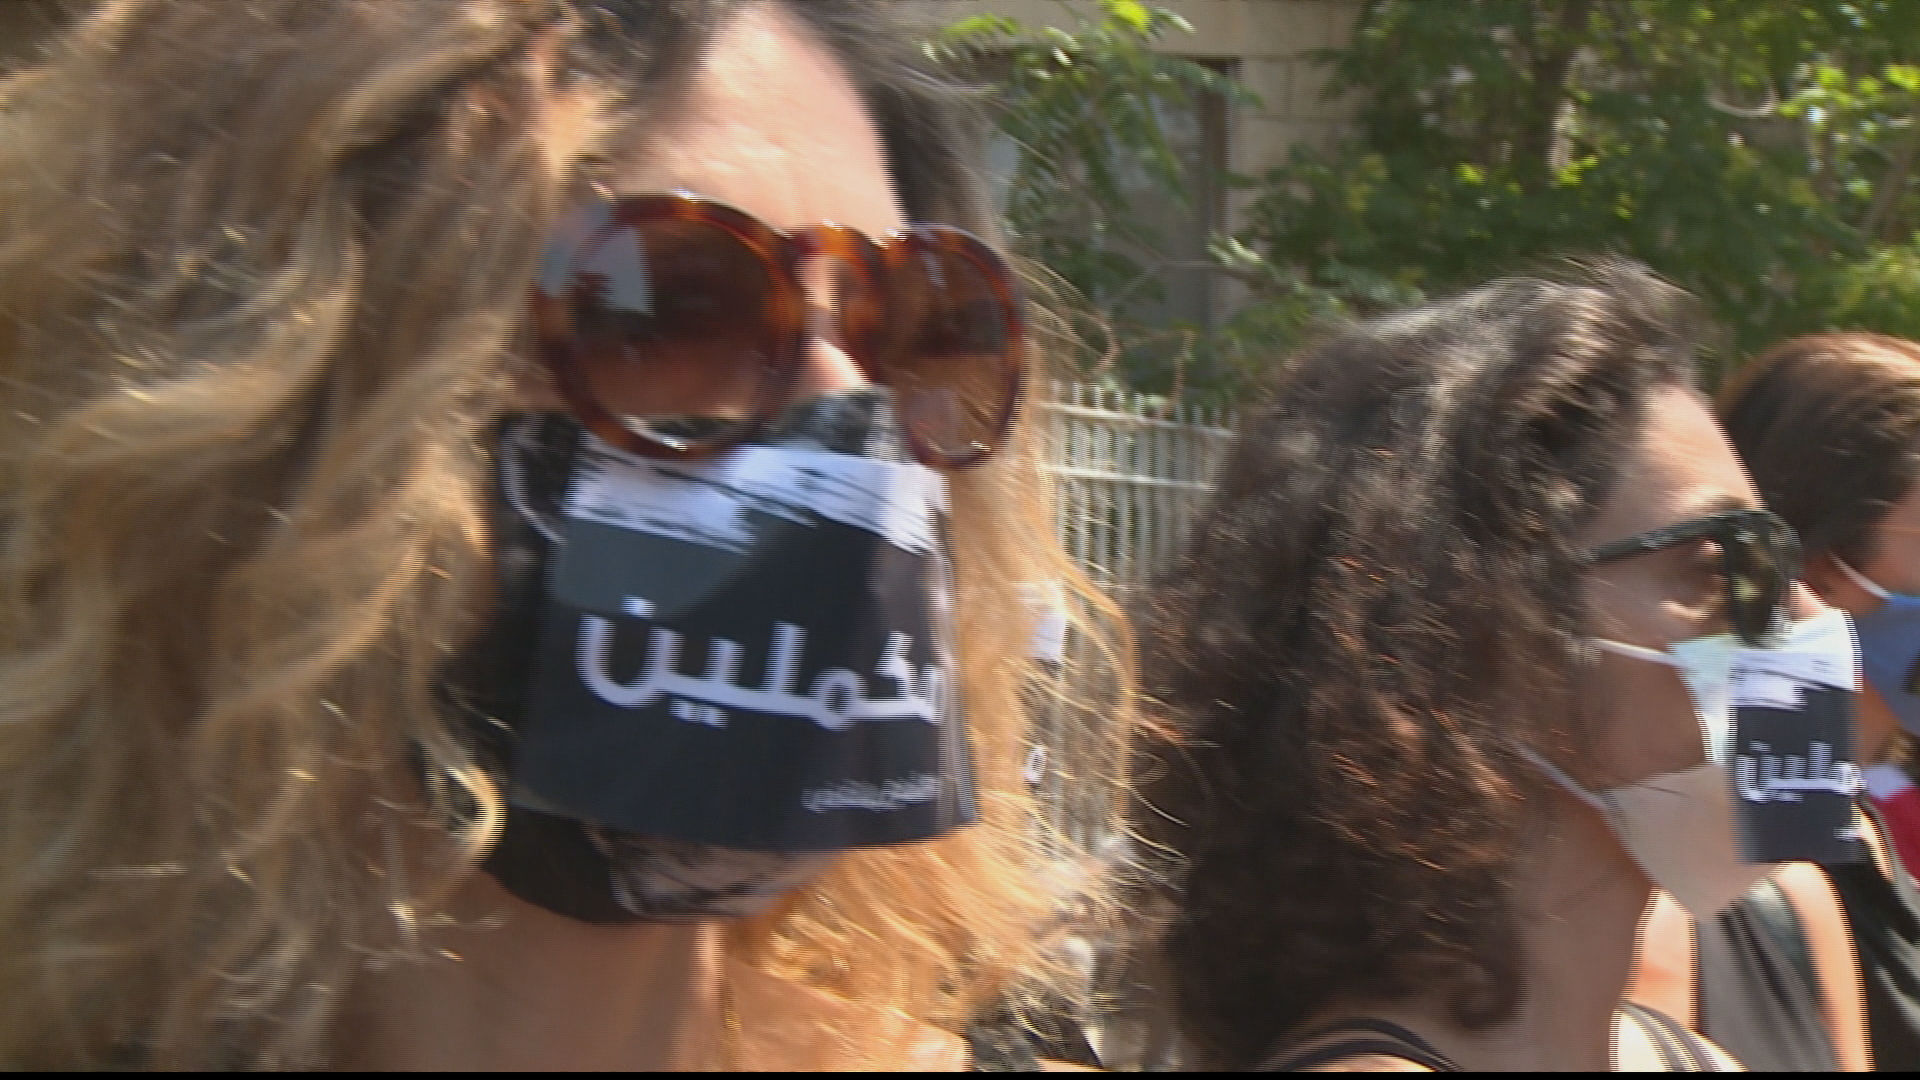 Attack On Prominent Lebanese Activist Raises Concerns Middle East Al Jazeera